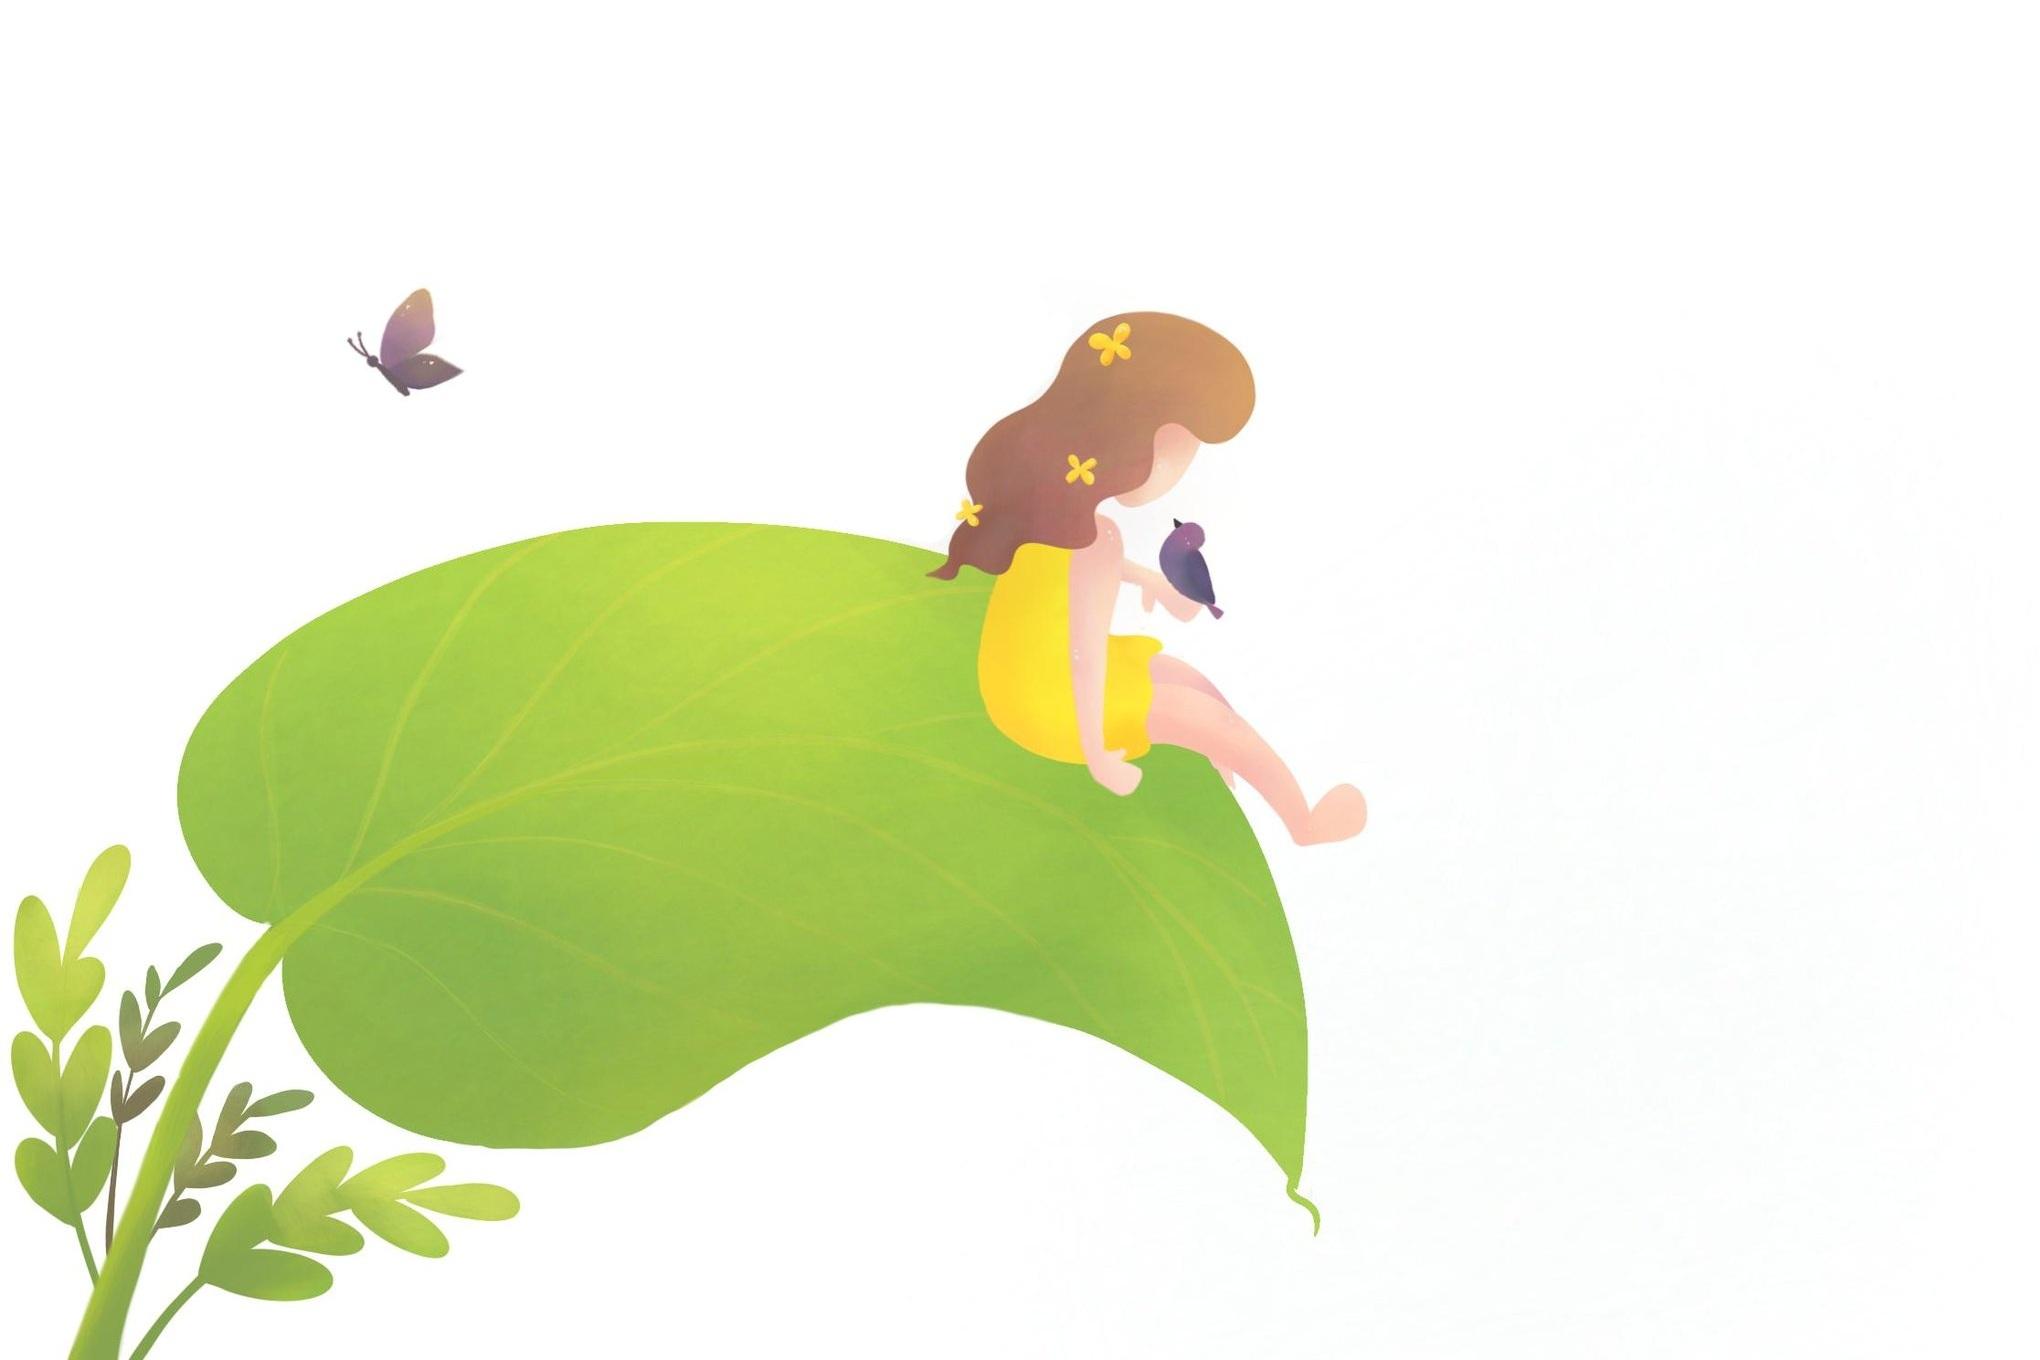 Life on a Leaf: Latest illustration using textures